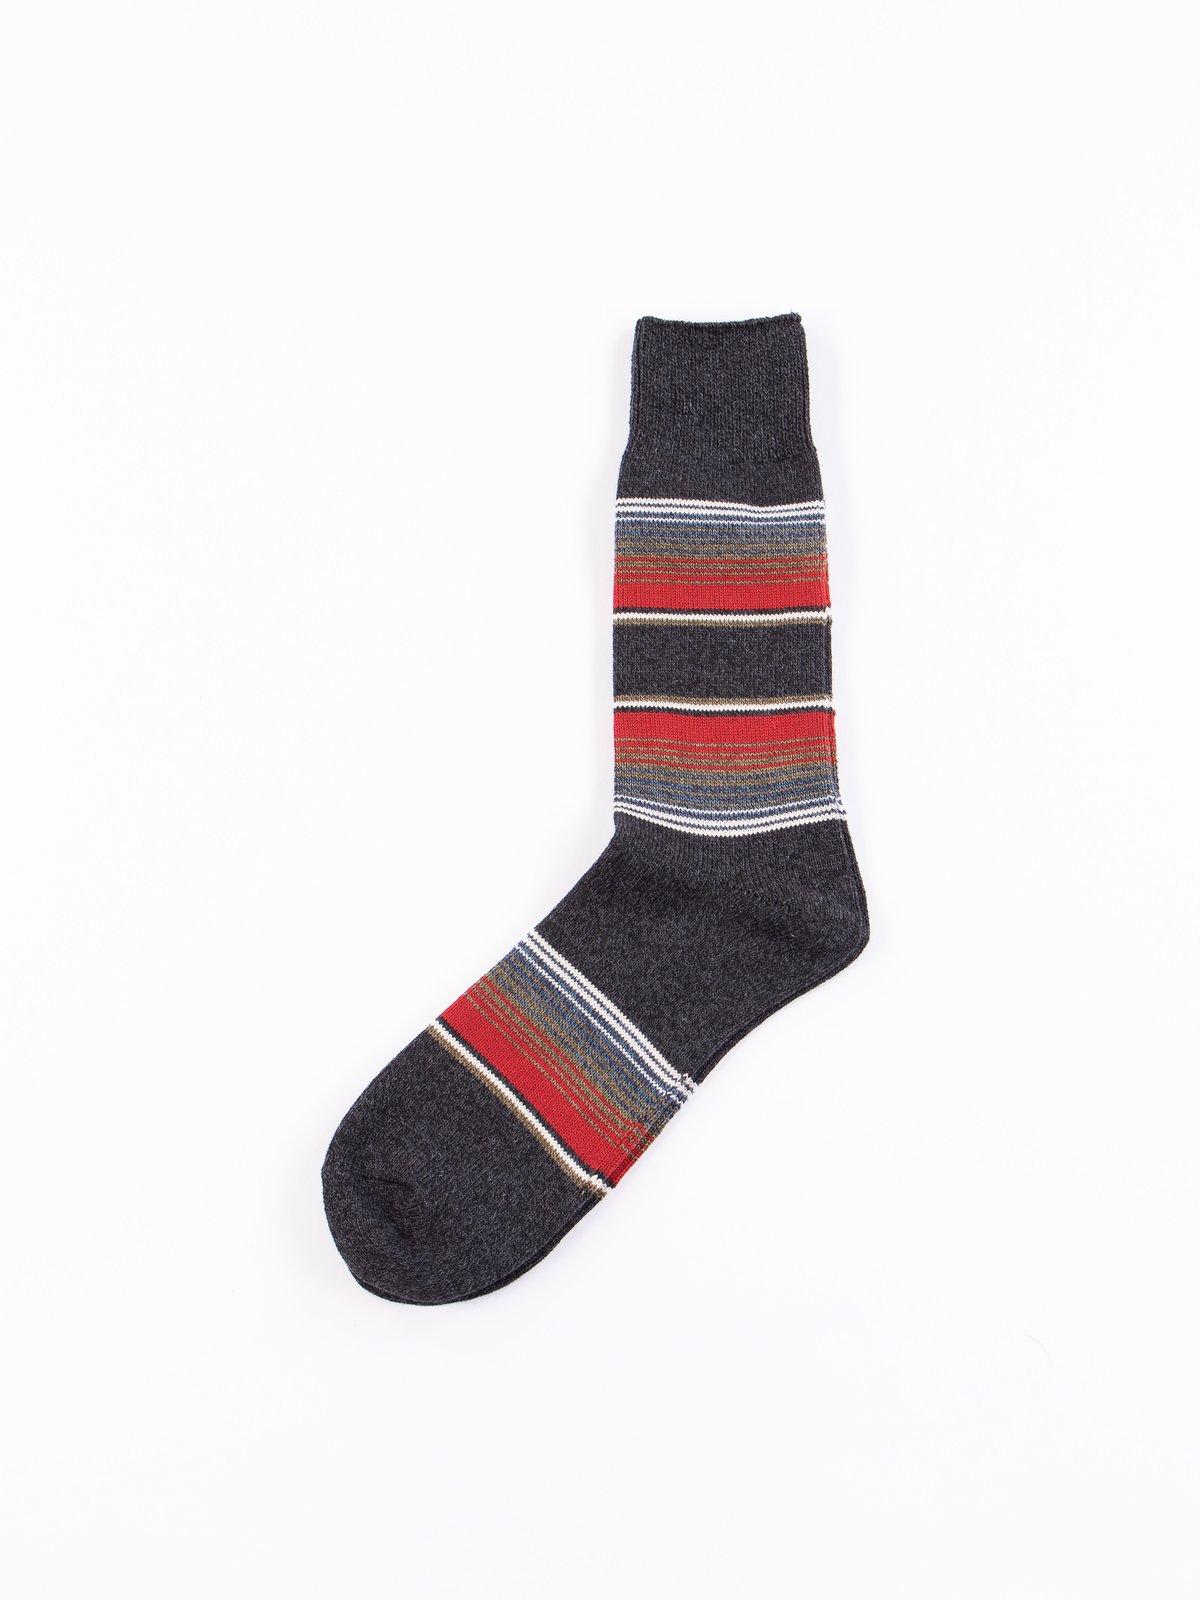 Charcoal Baja Cali Stripe Socks - Image 1